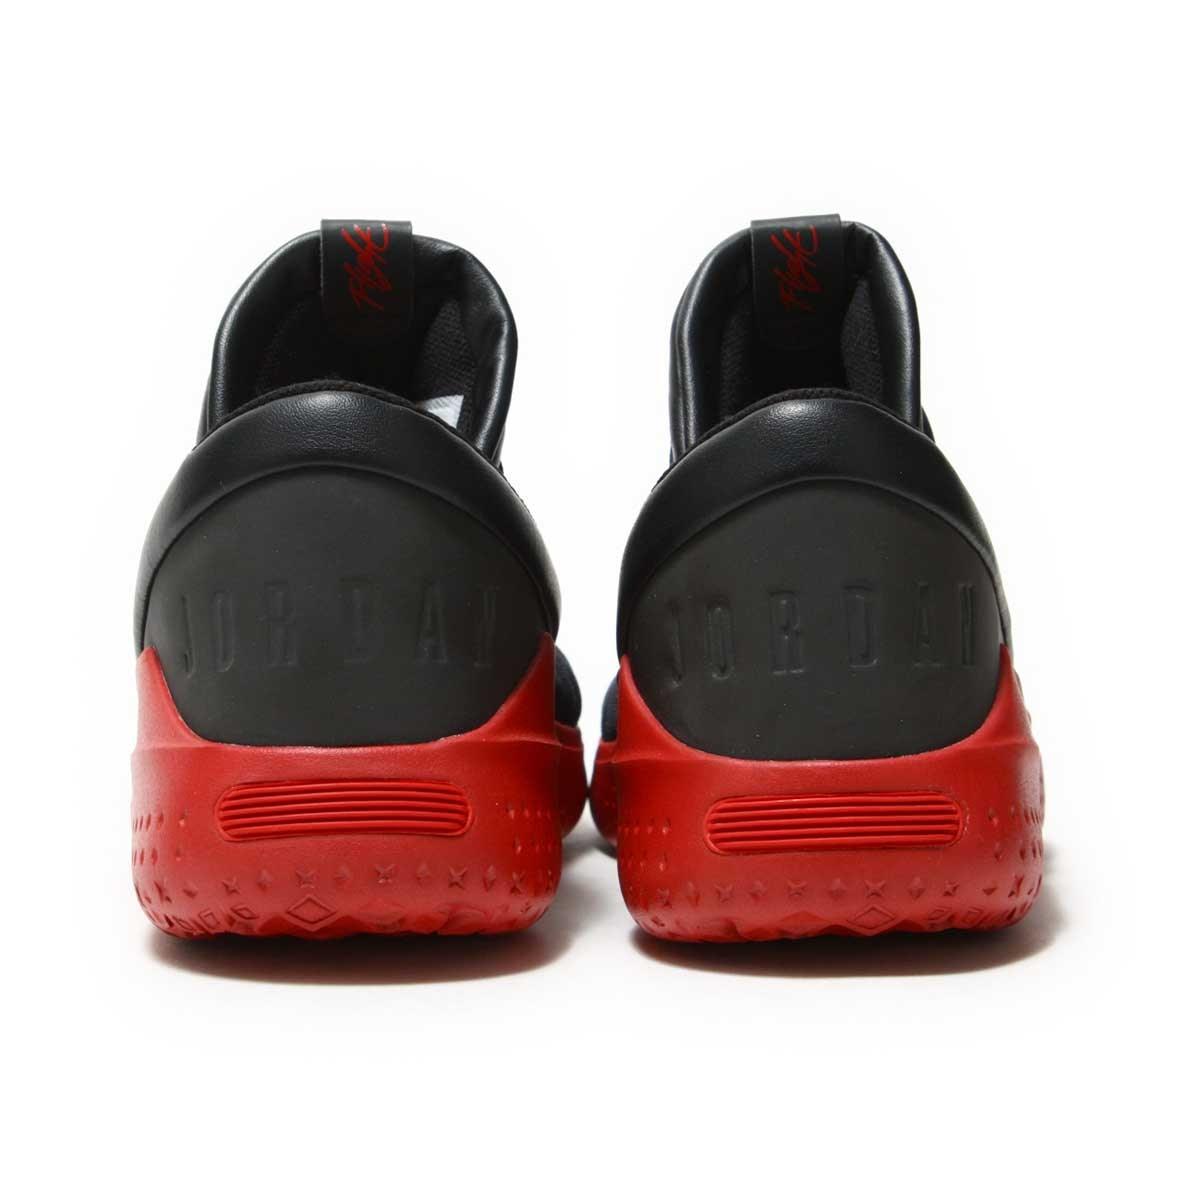 db6f01f1be0 NIKE JORDAN FLIGHT LUXE (Nike Jordan flight LUXE) BLACK GYM RED-GYM RED  17HO-I